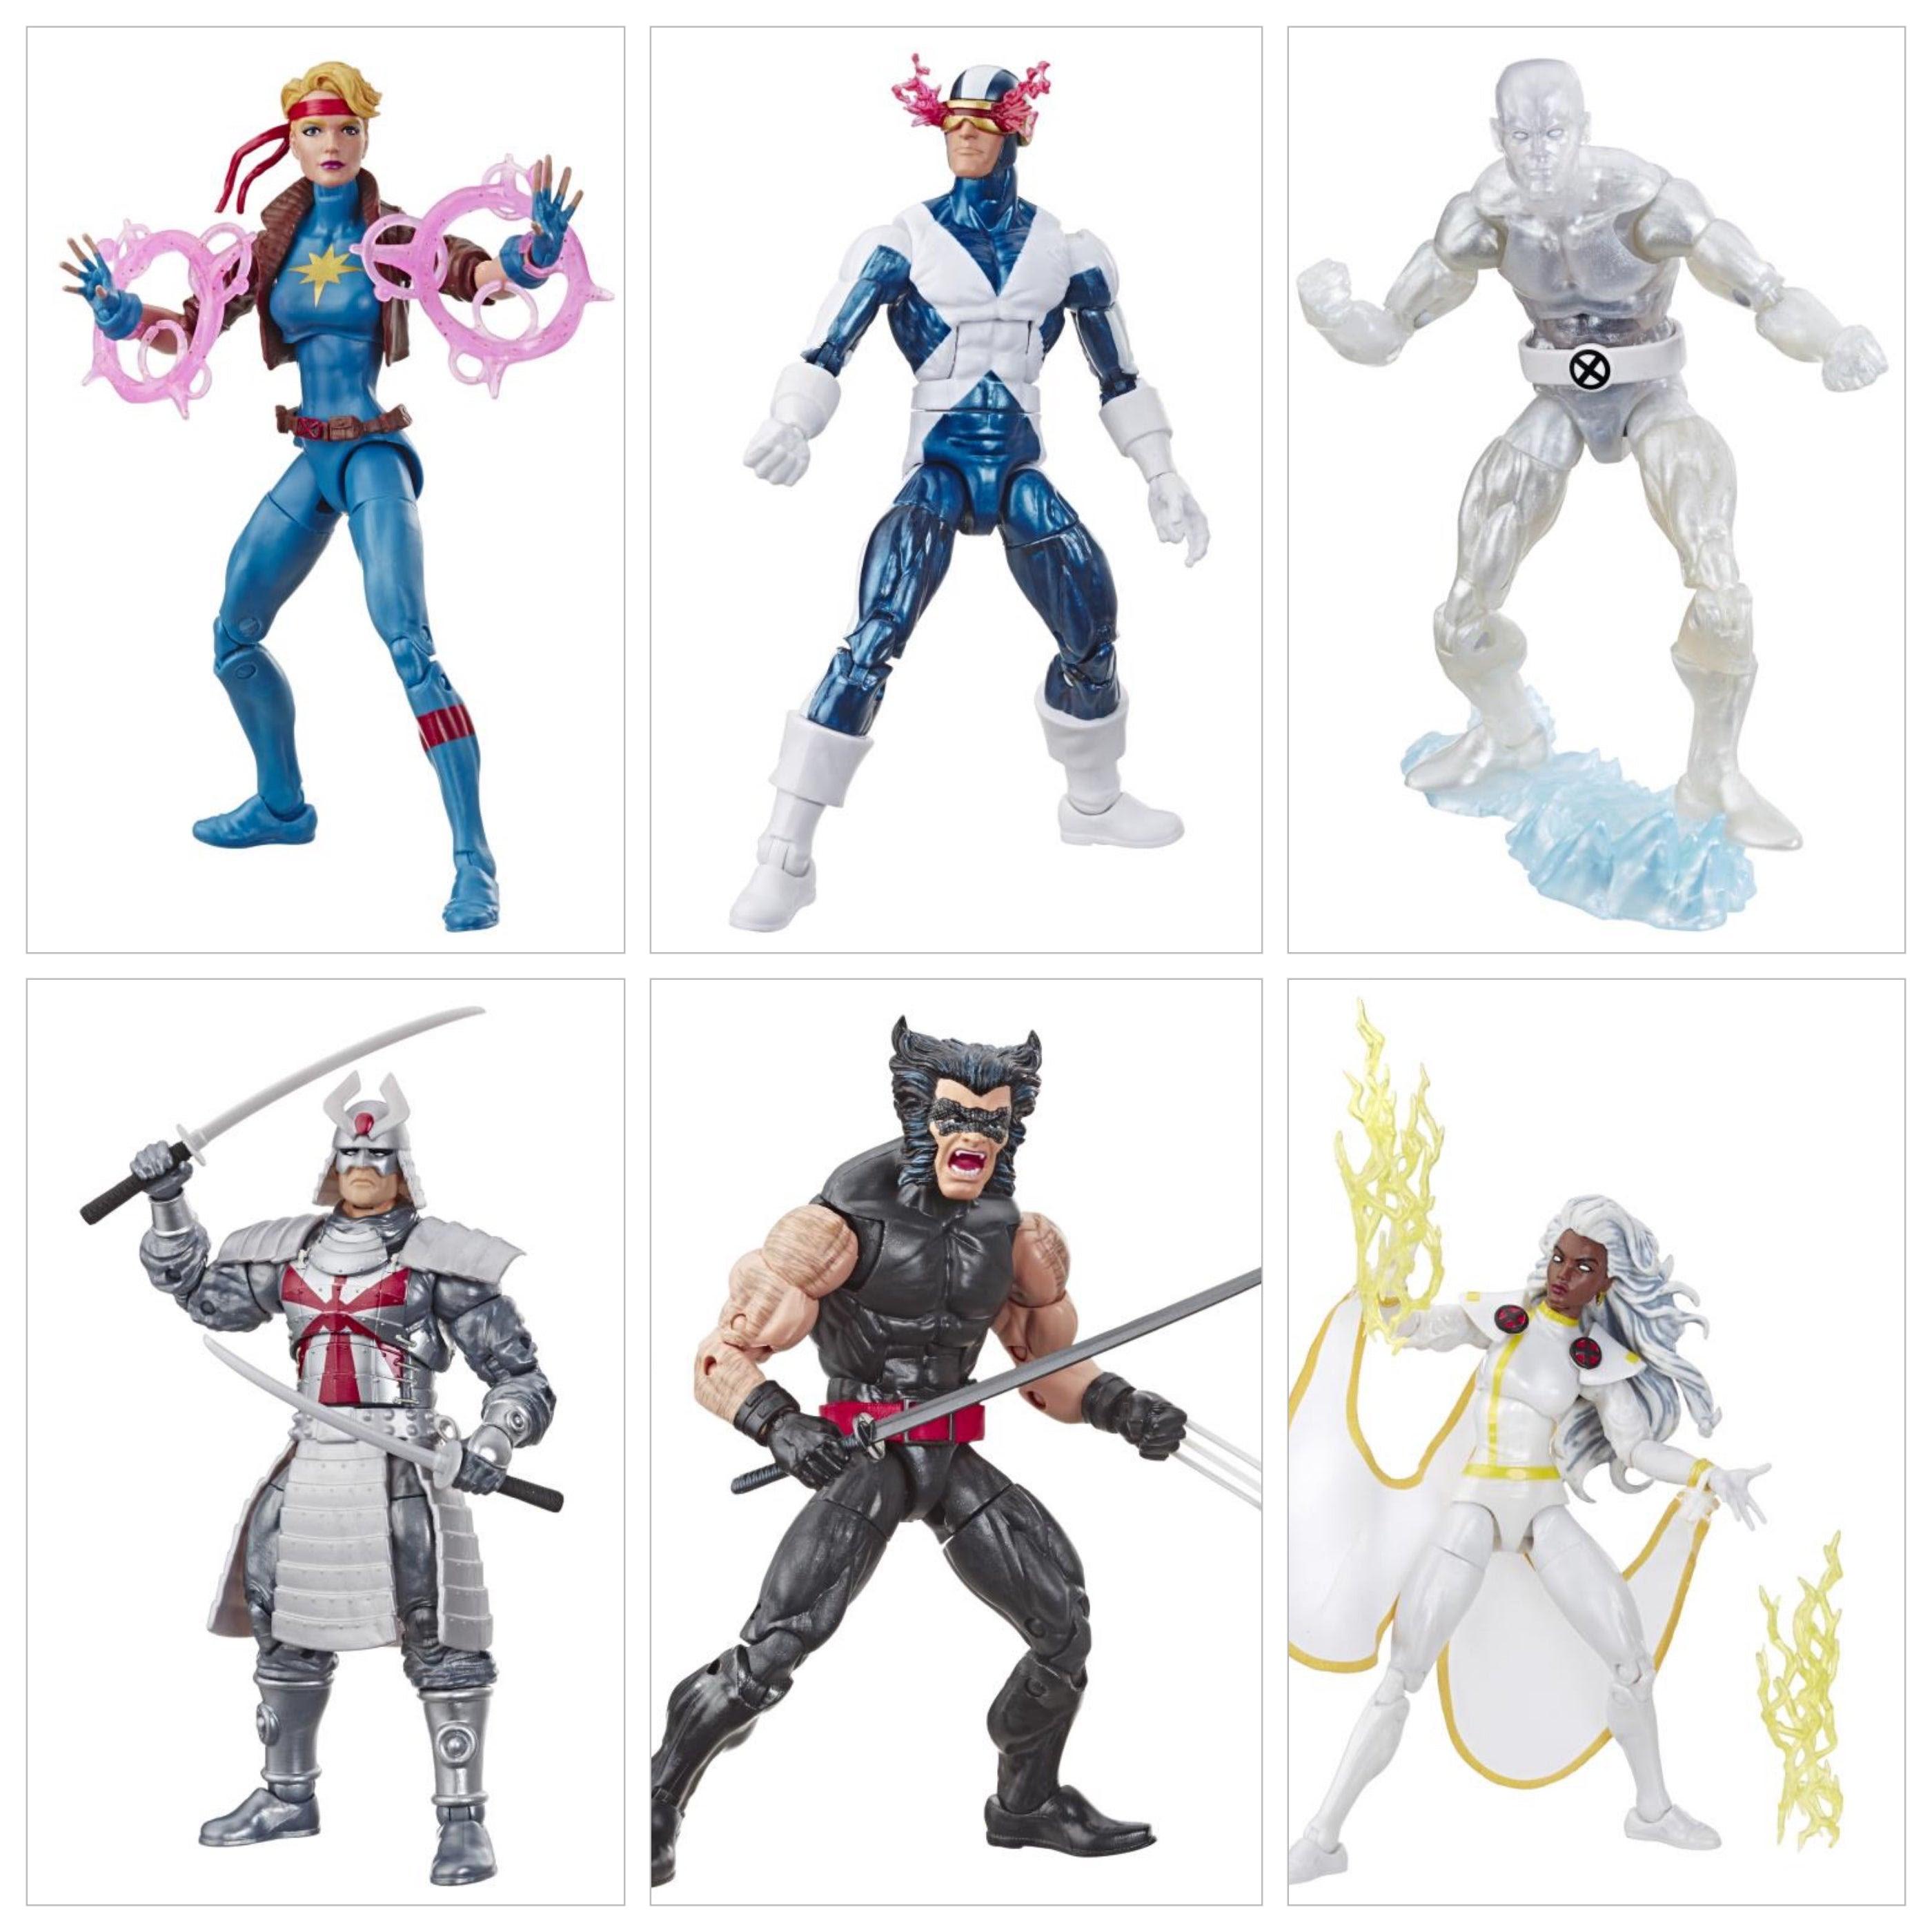 Image of X-Men Retro Marvel Legends 6-Inch Action Figures - Set of 6